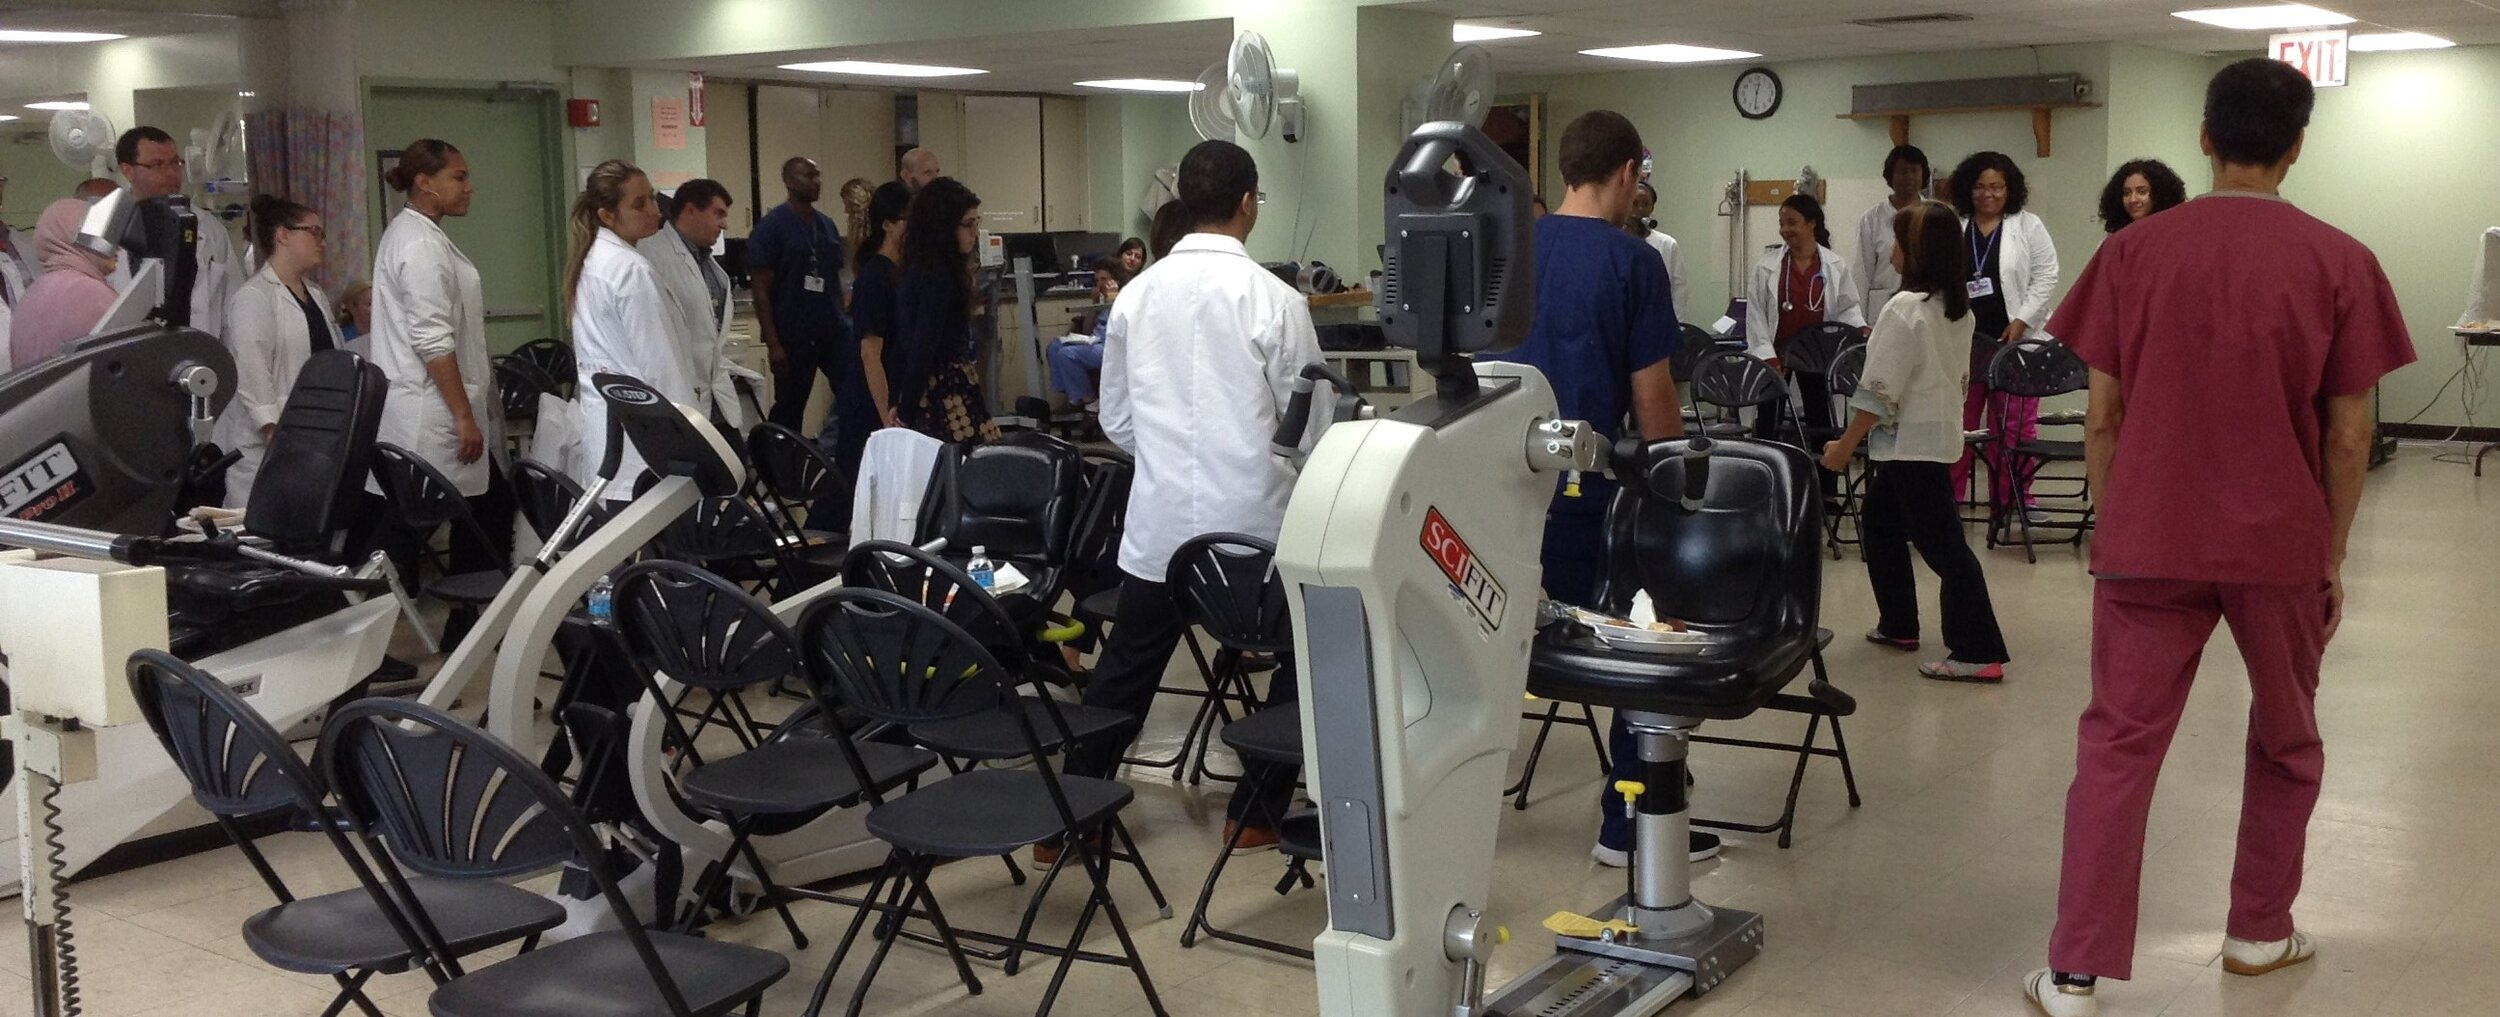 Tai Chi workshop at Kingsbrook Jewish Medical Center